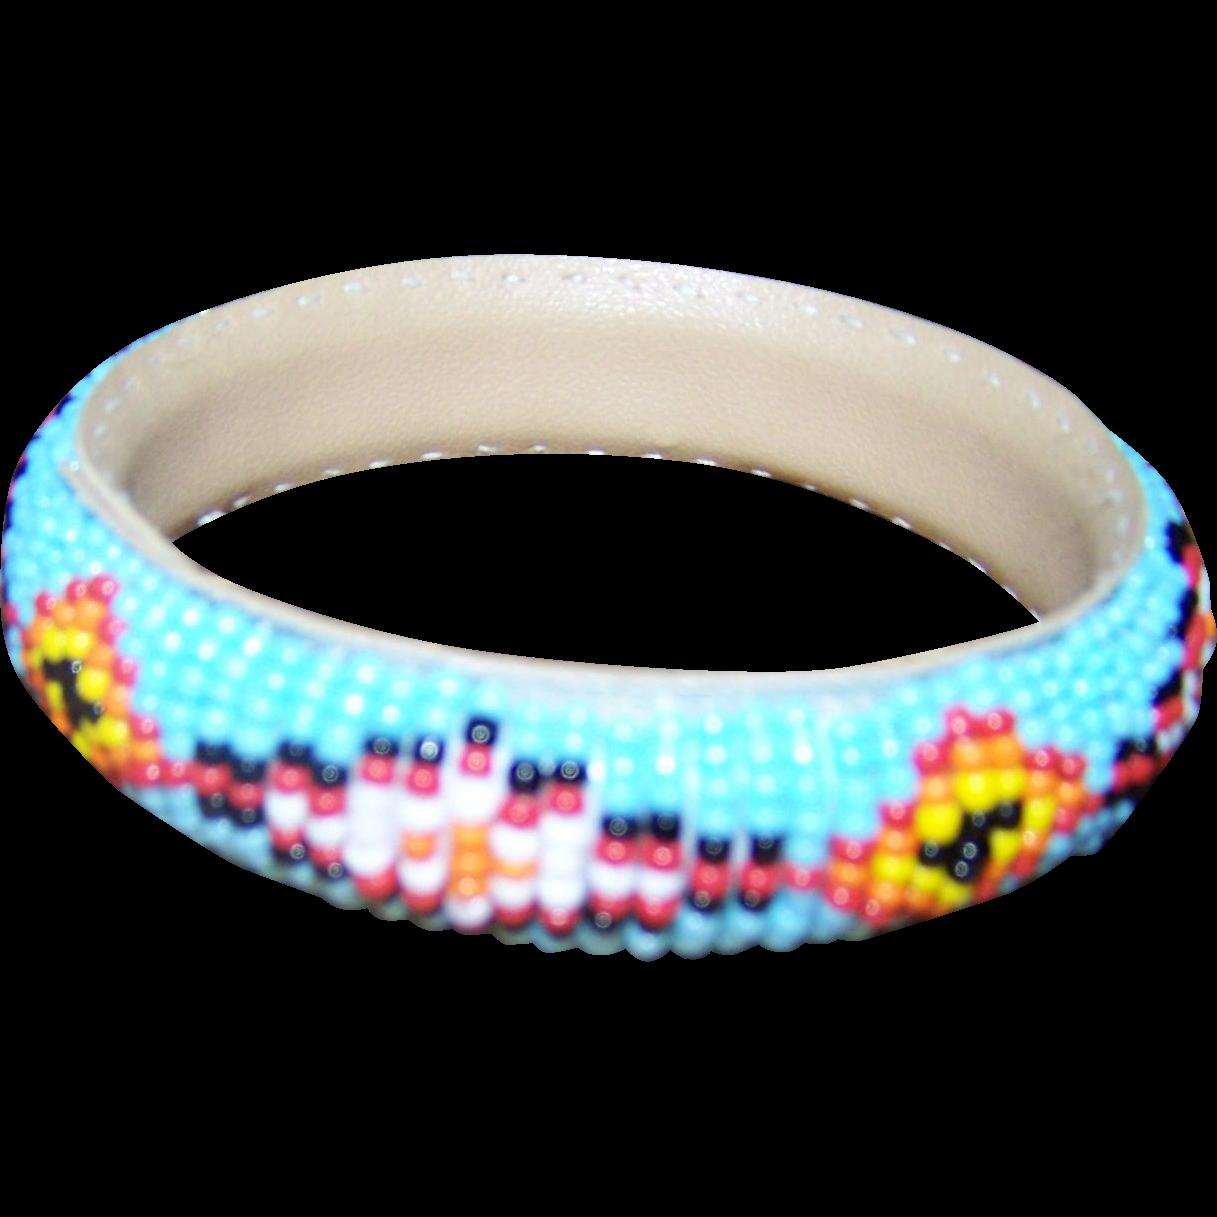 A Lovely Vintage Native American Seed Glass Bead Bangle Bracelet